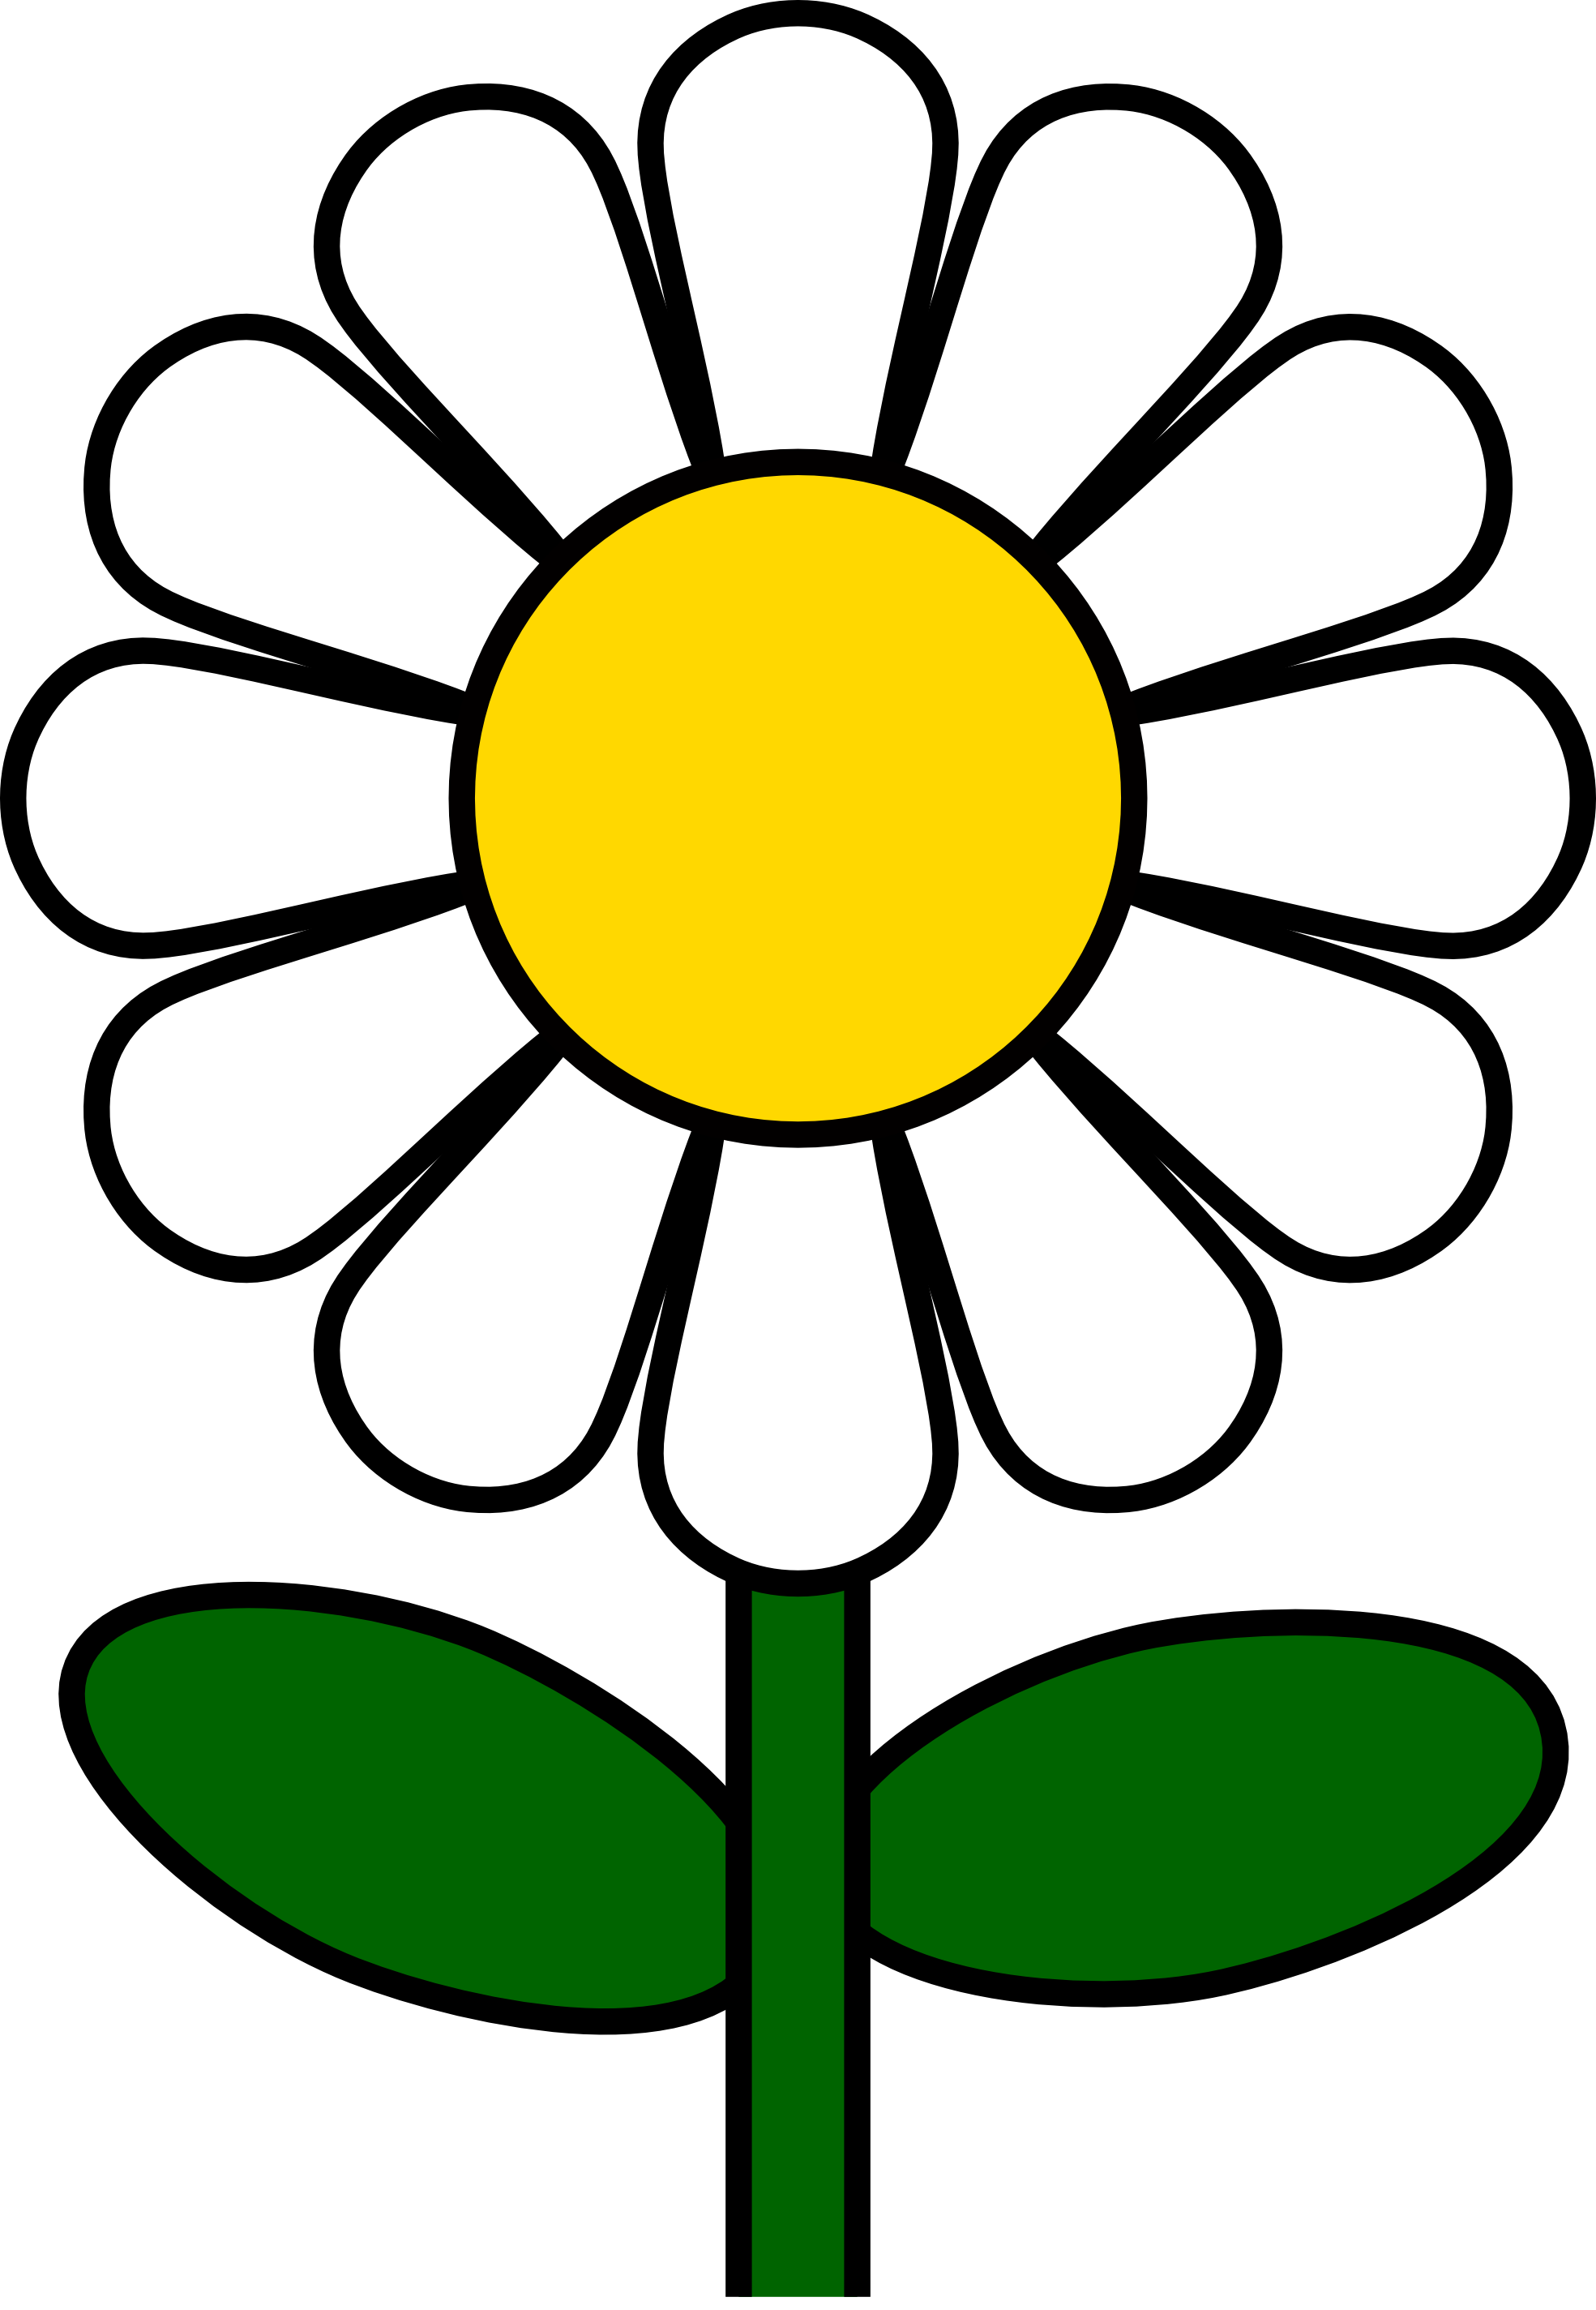 Daisy Clipart #1